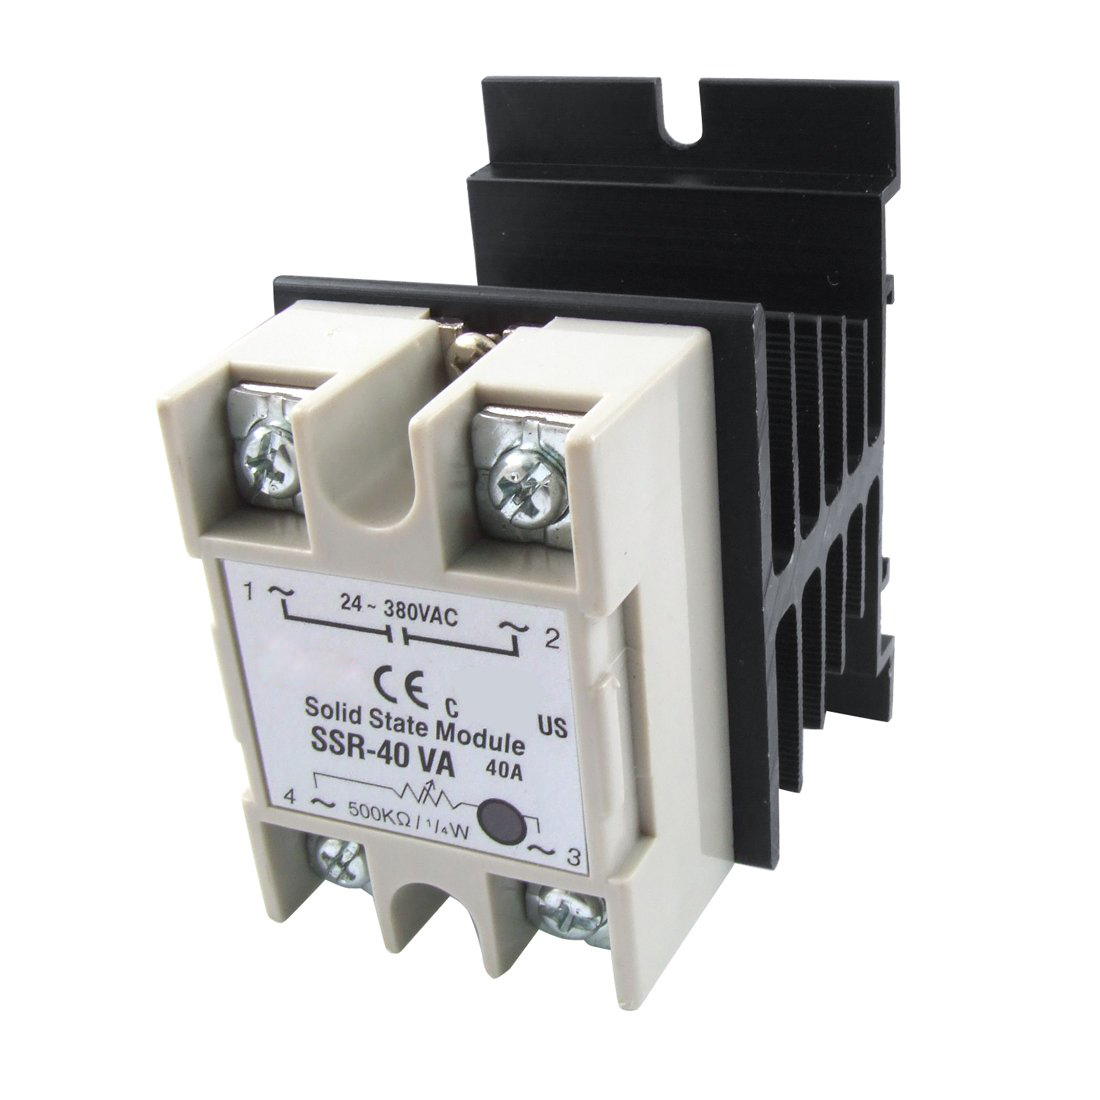 LHLL- VolTage Resistance Regulator Solid State Relay SSR 40A 24-380V AC w Heat SInk 500kohm 2w 24 380vac 40a ssr solid state relay resistance regulator